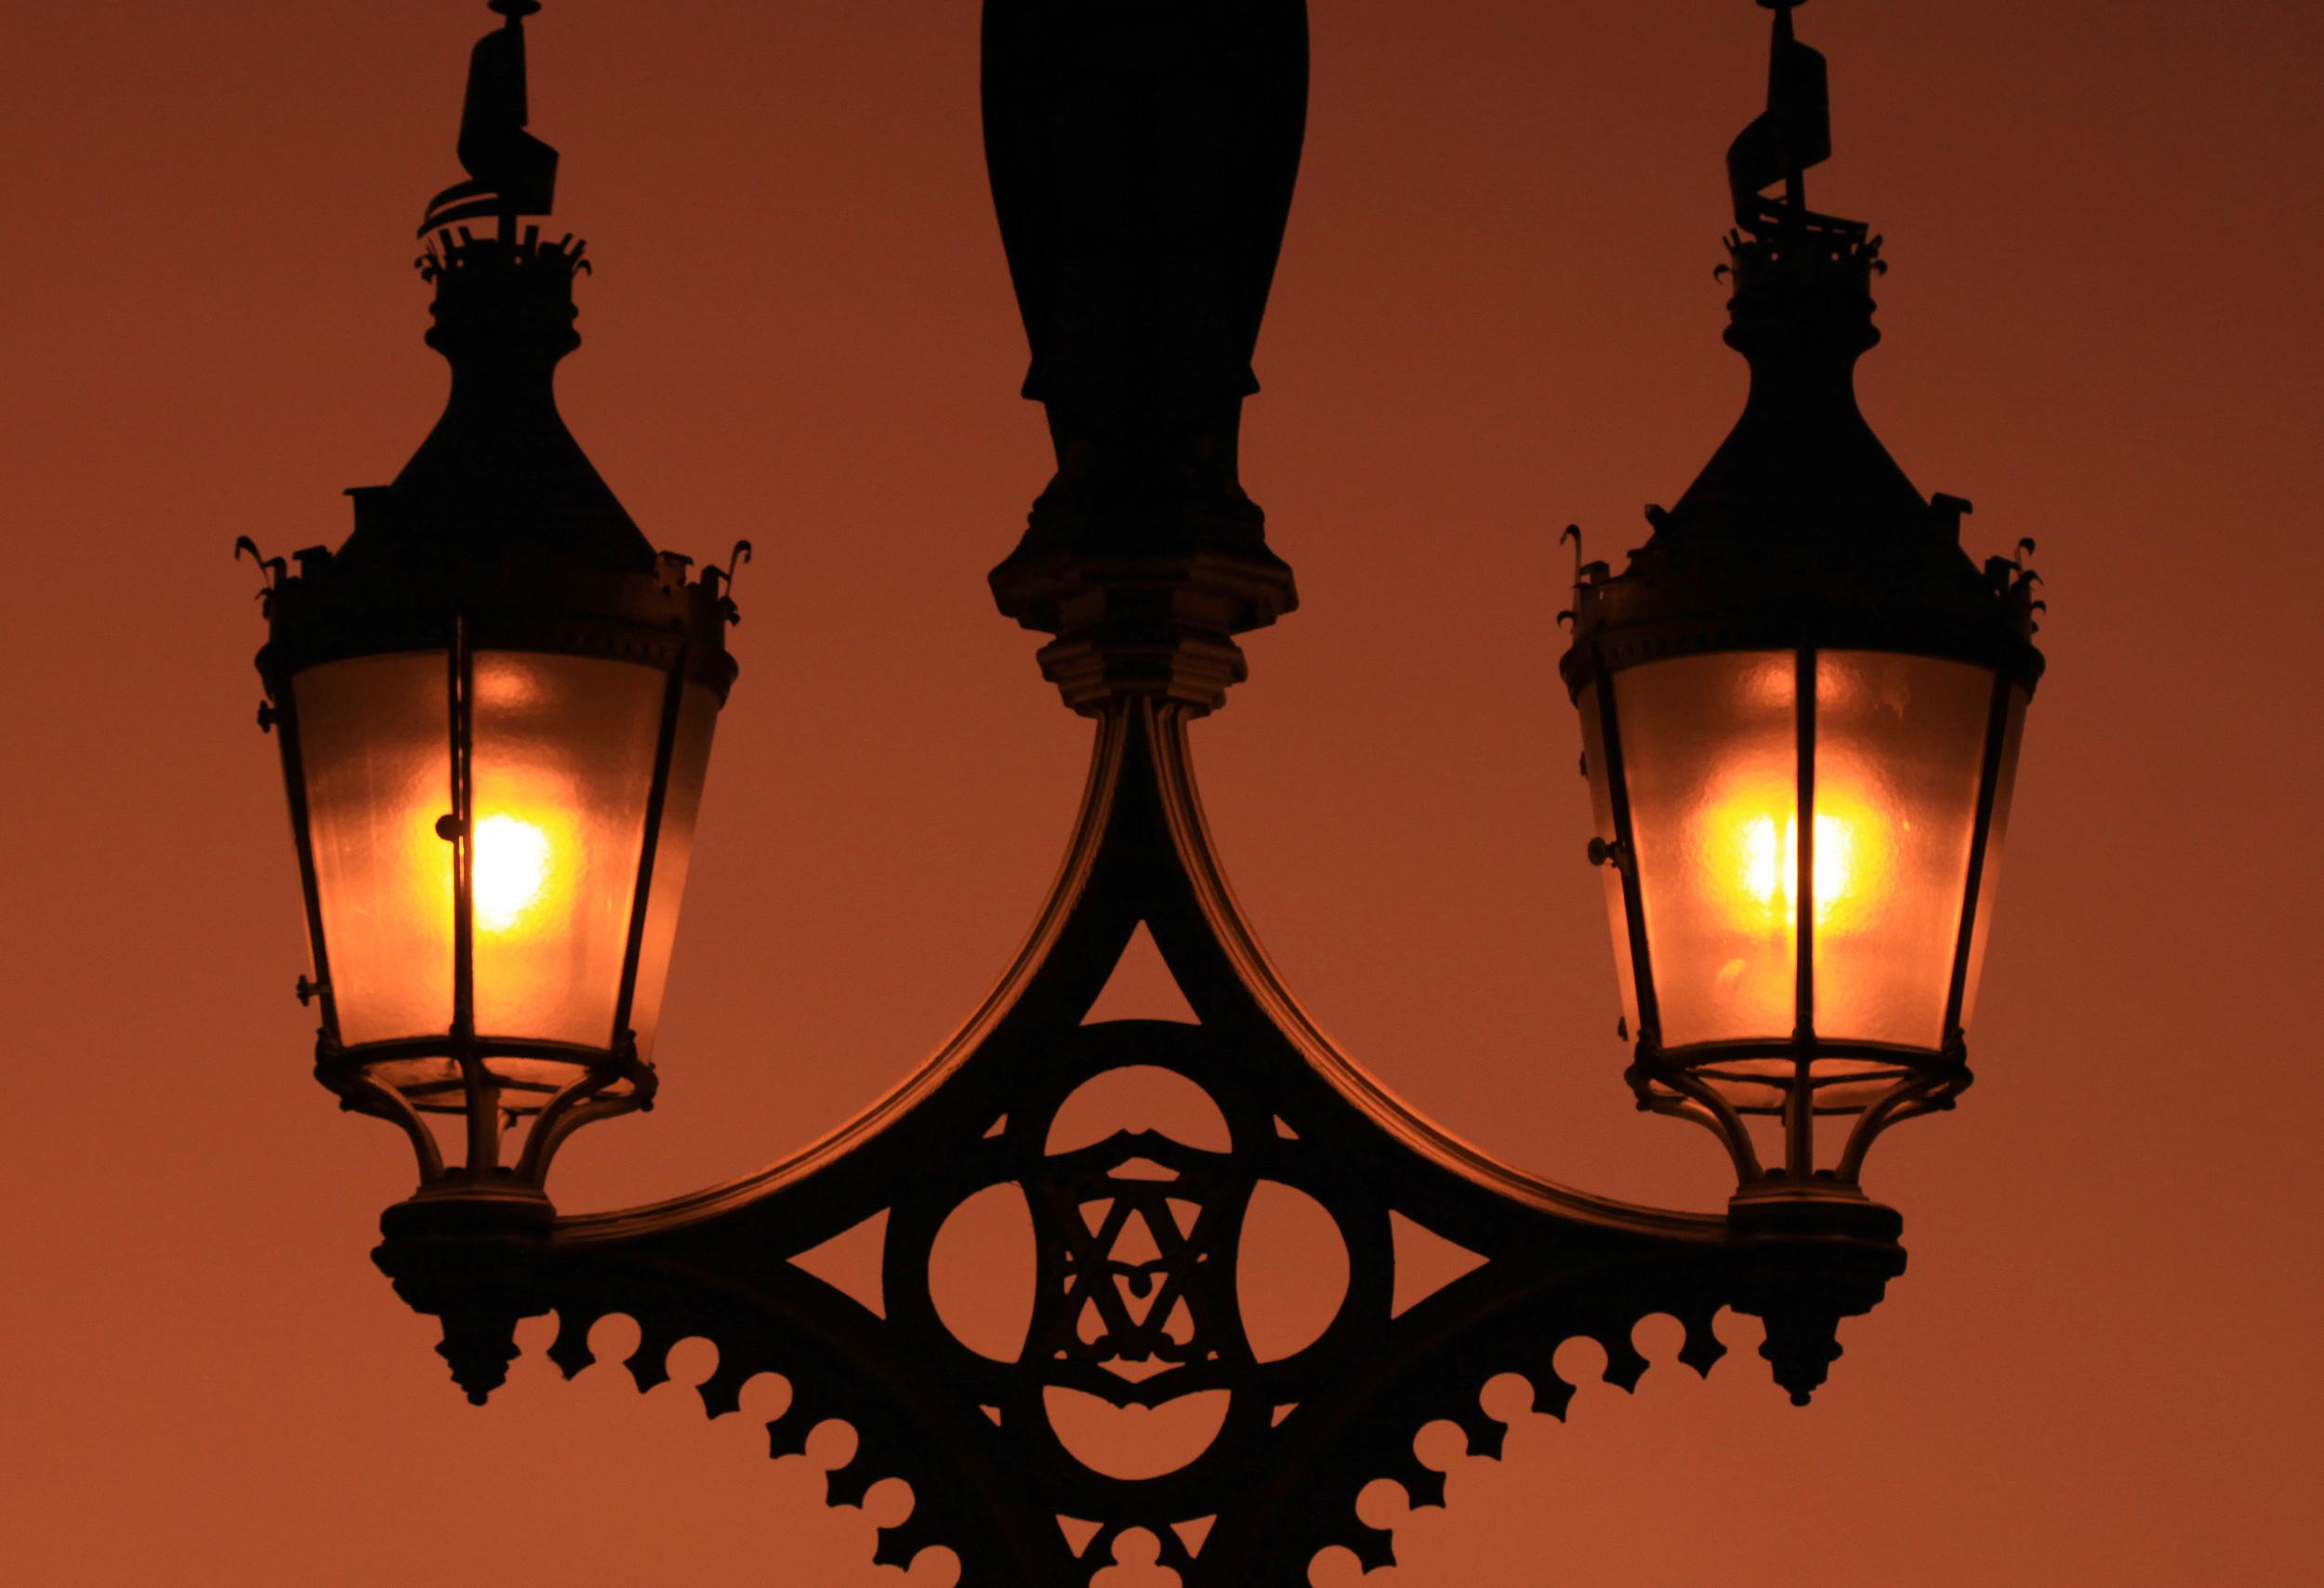 Street Lamps at sunrise